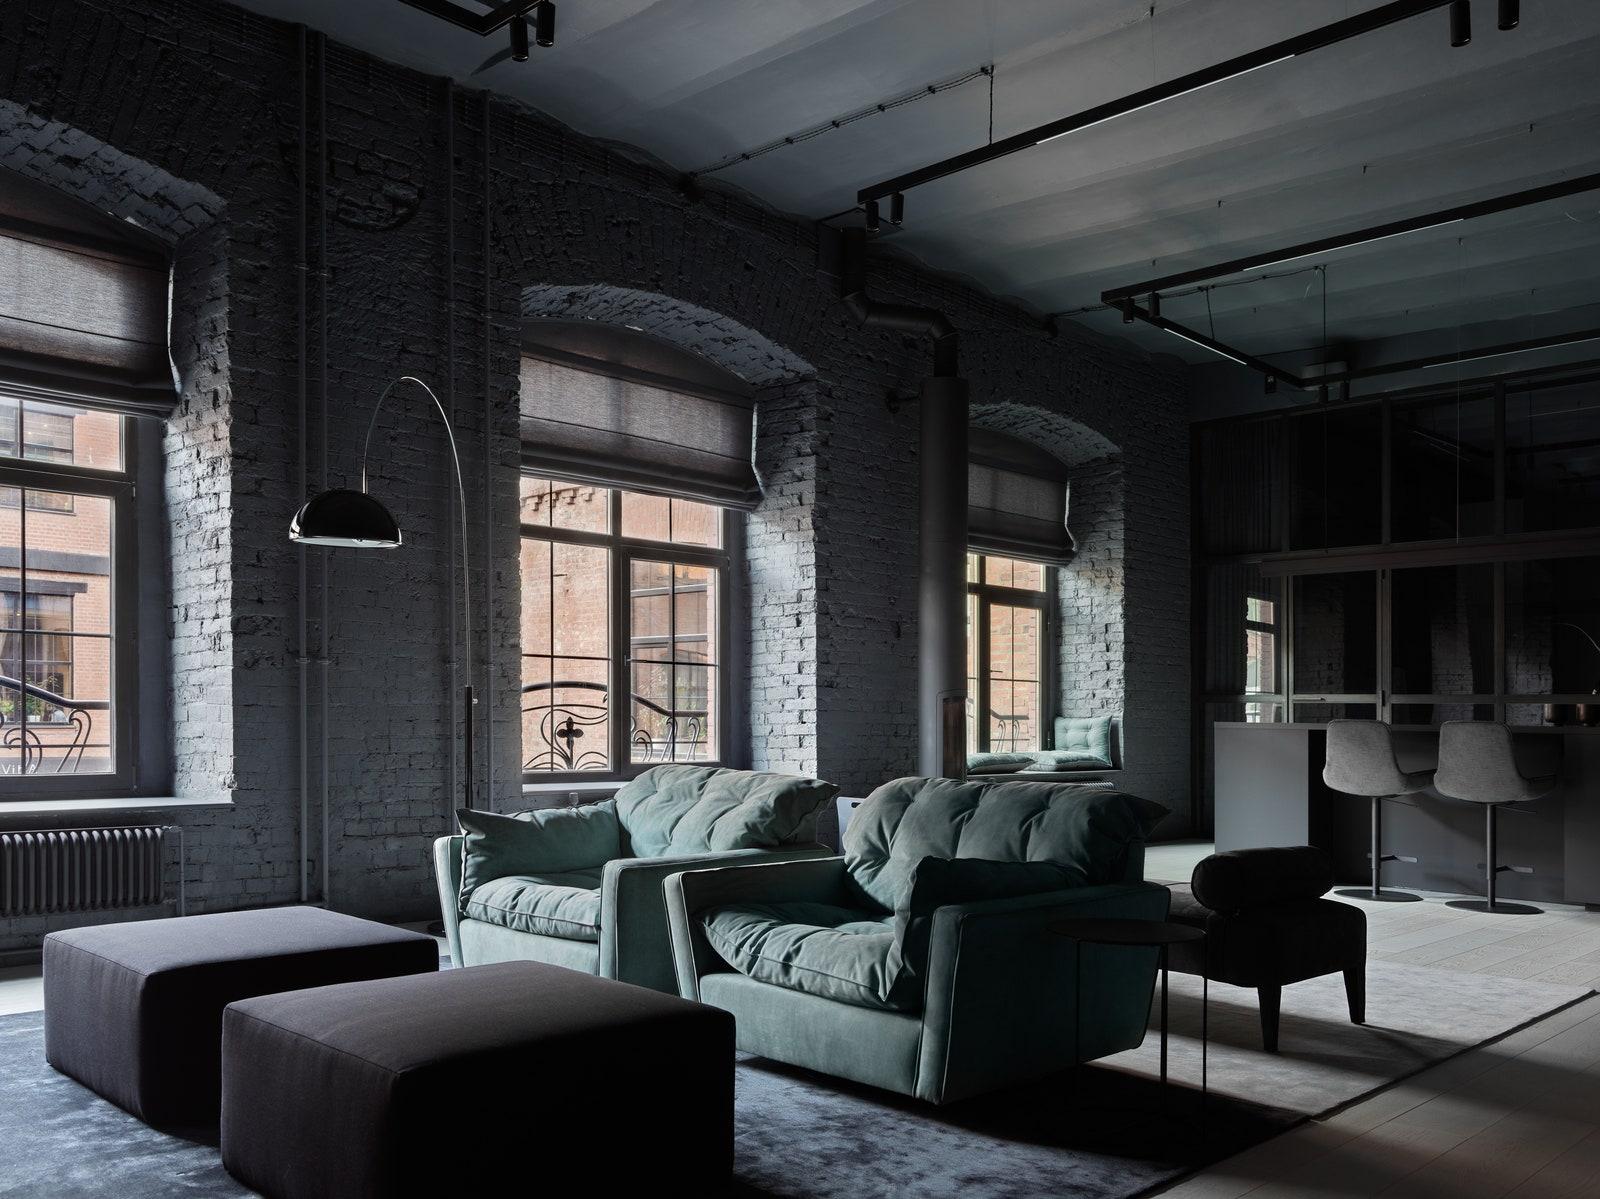 .    Baxter  Walter Knoll  Korb         RDP Home    Freifrau  Oluce  Delta Light  Focus Fireplaces.      M Carpet...